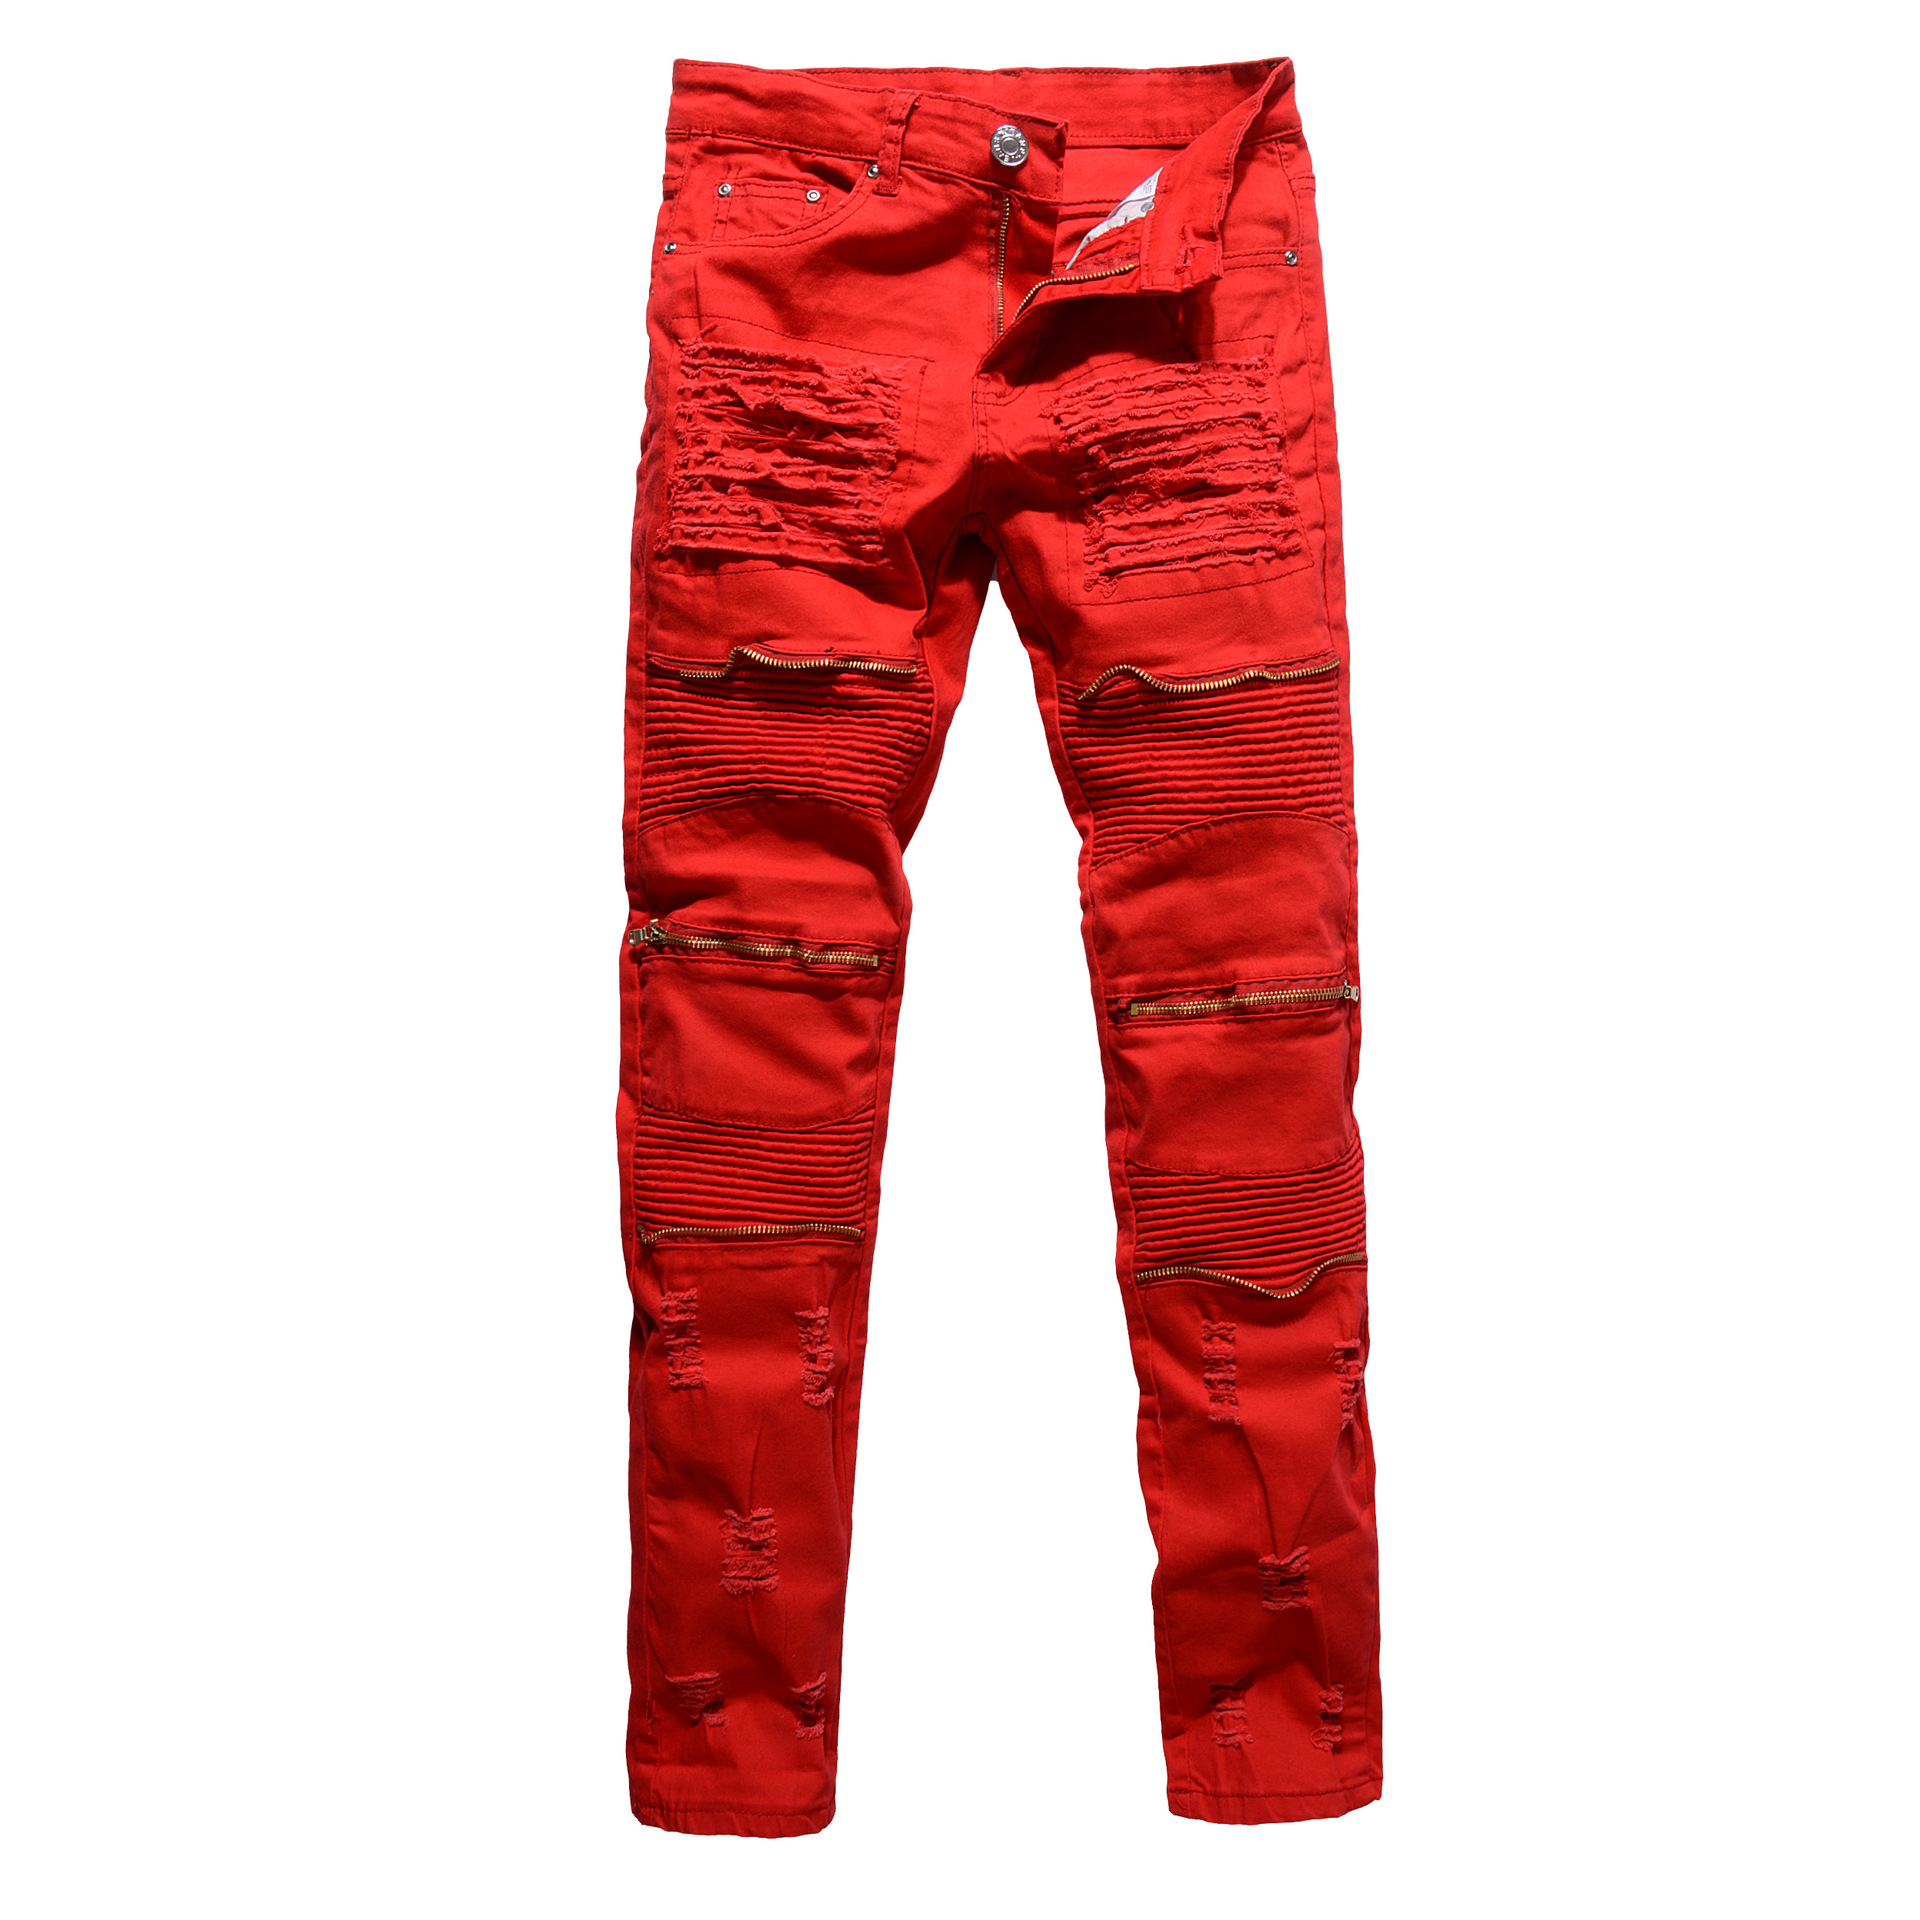 2017 Mens Male Club Biker Jeans White /red/black Knee Multi zipper Men Brand Slim Fit Cut Destroyed Jean Pants For Male Homme